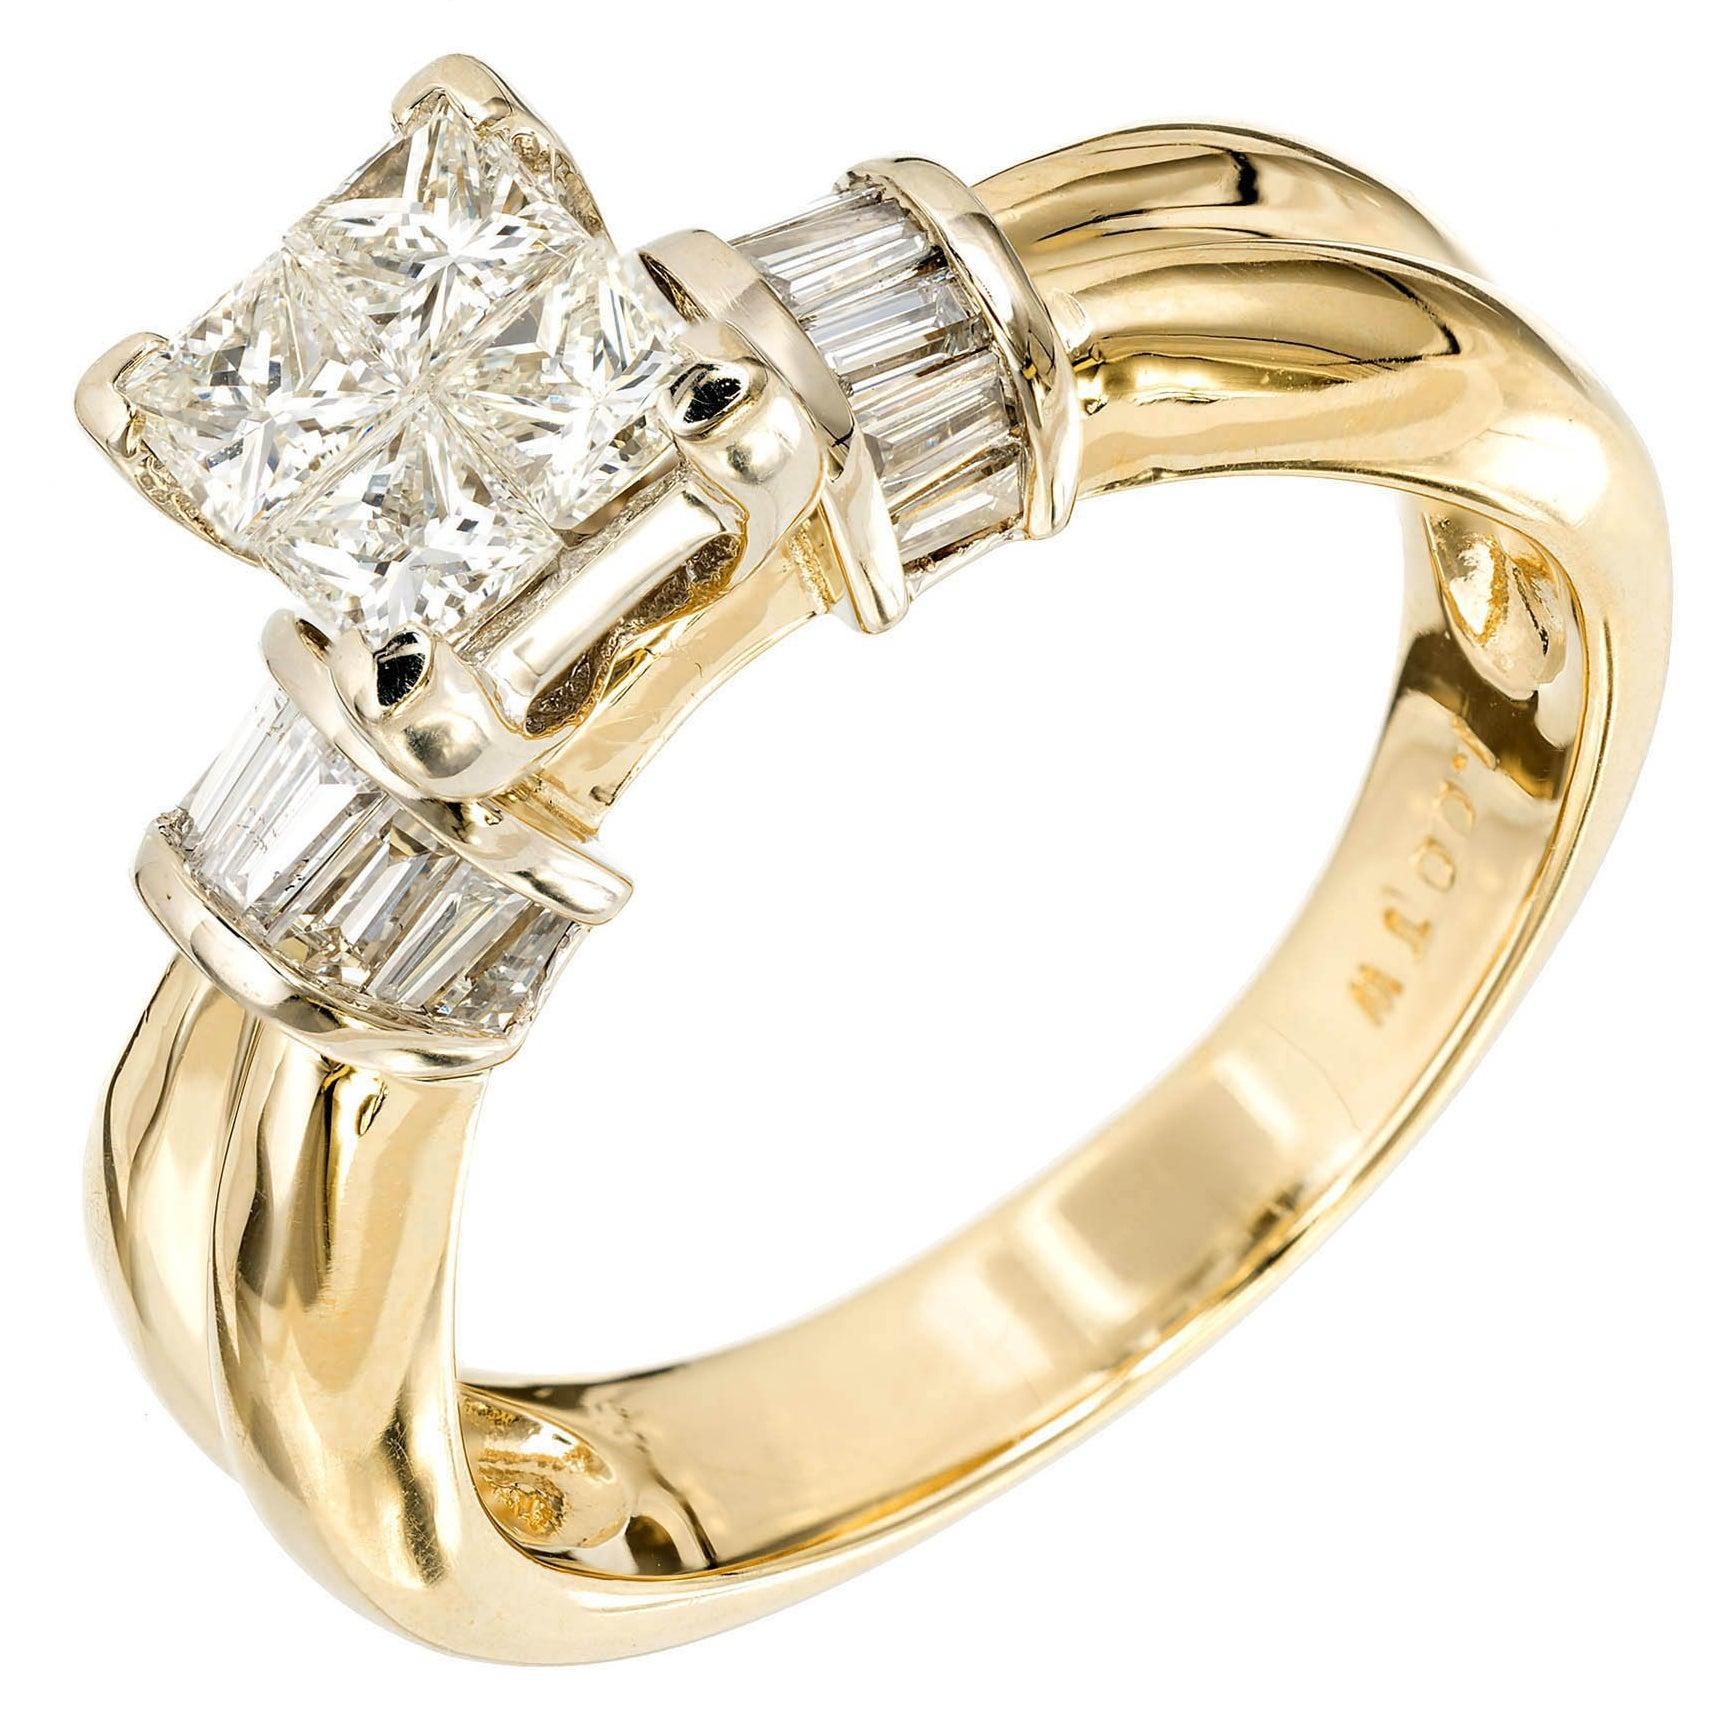 1.00 Carat Diamond Princess Cut Gold Engagement Ring